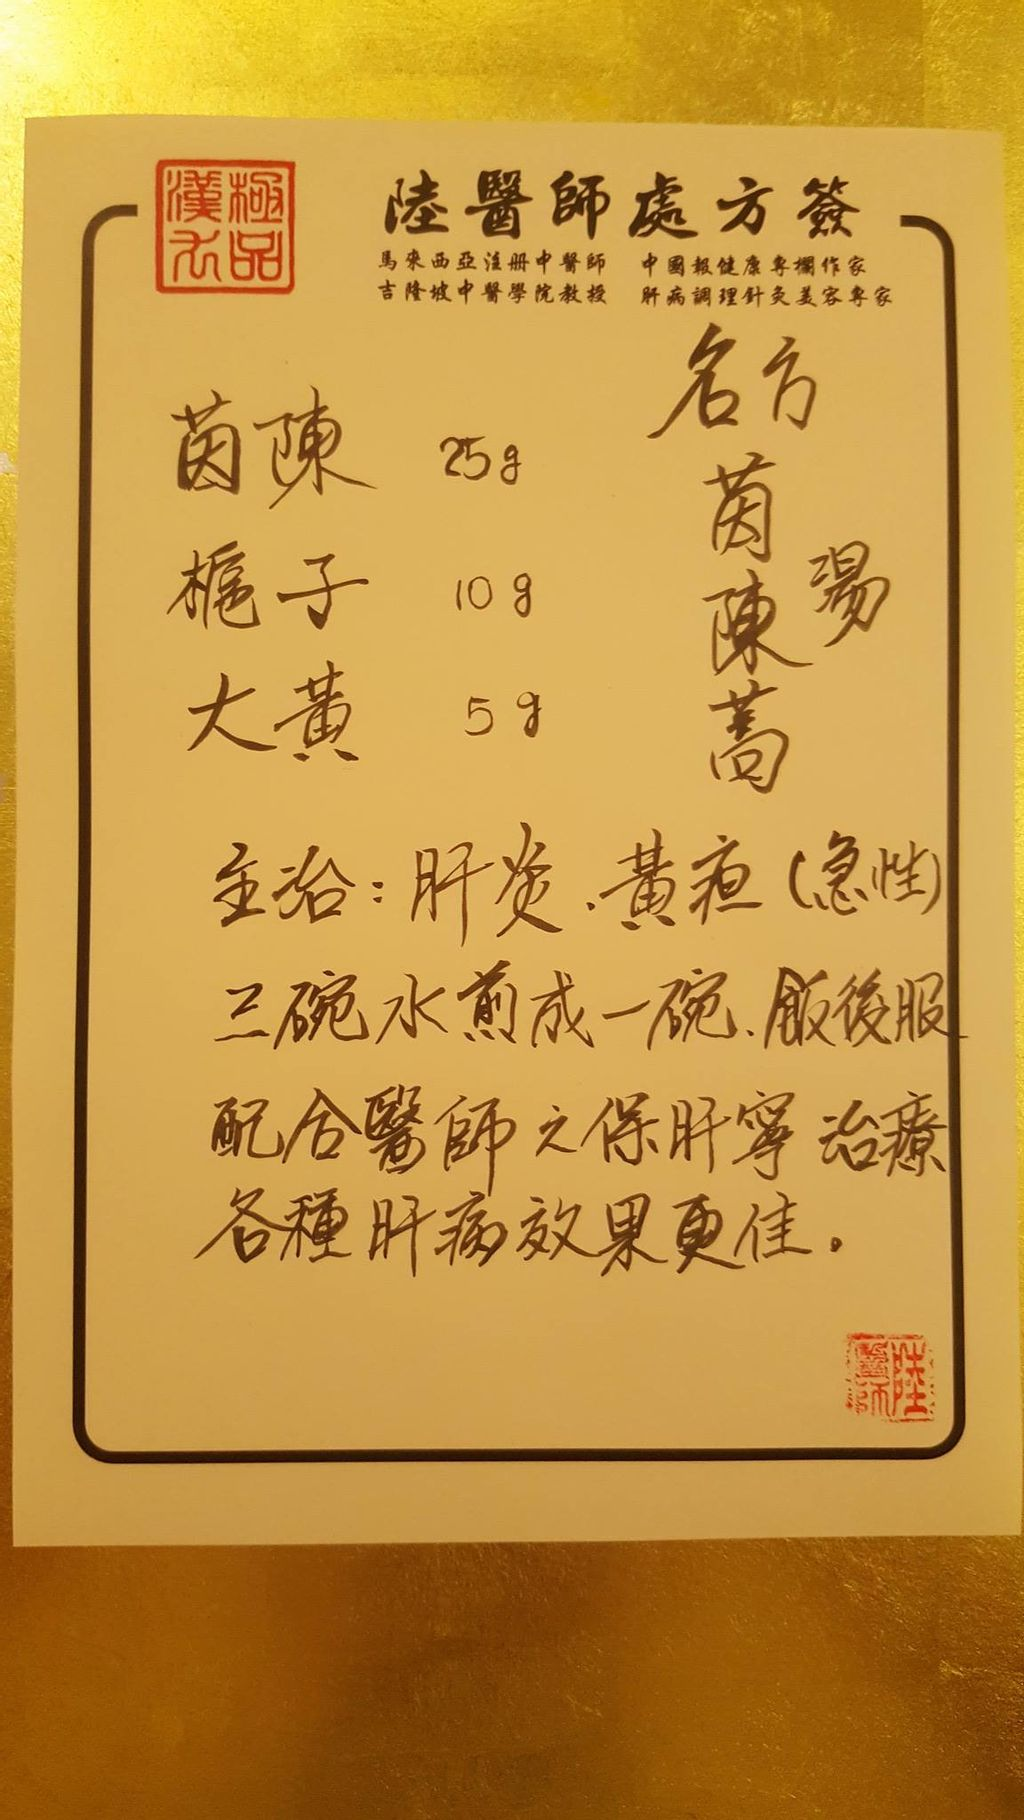 Recipe for Liver【肝炎 黃疸 】